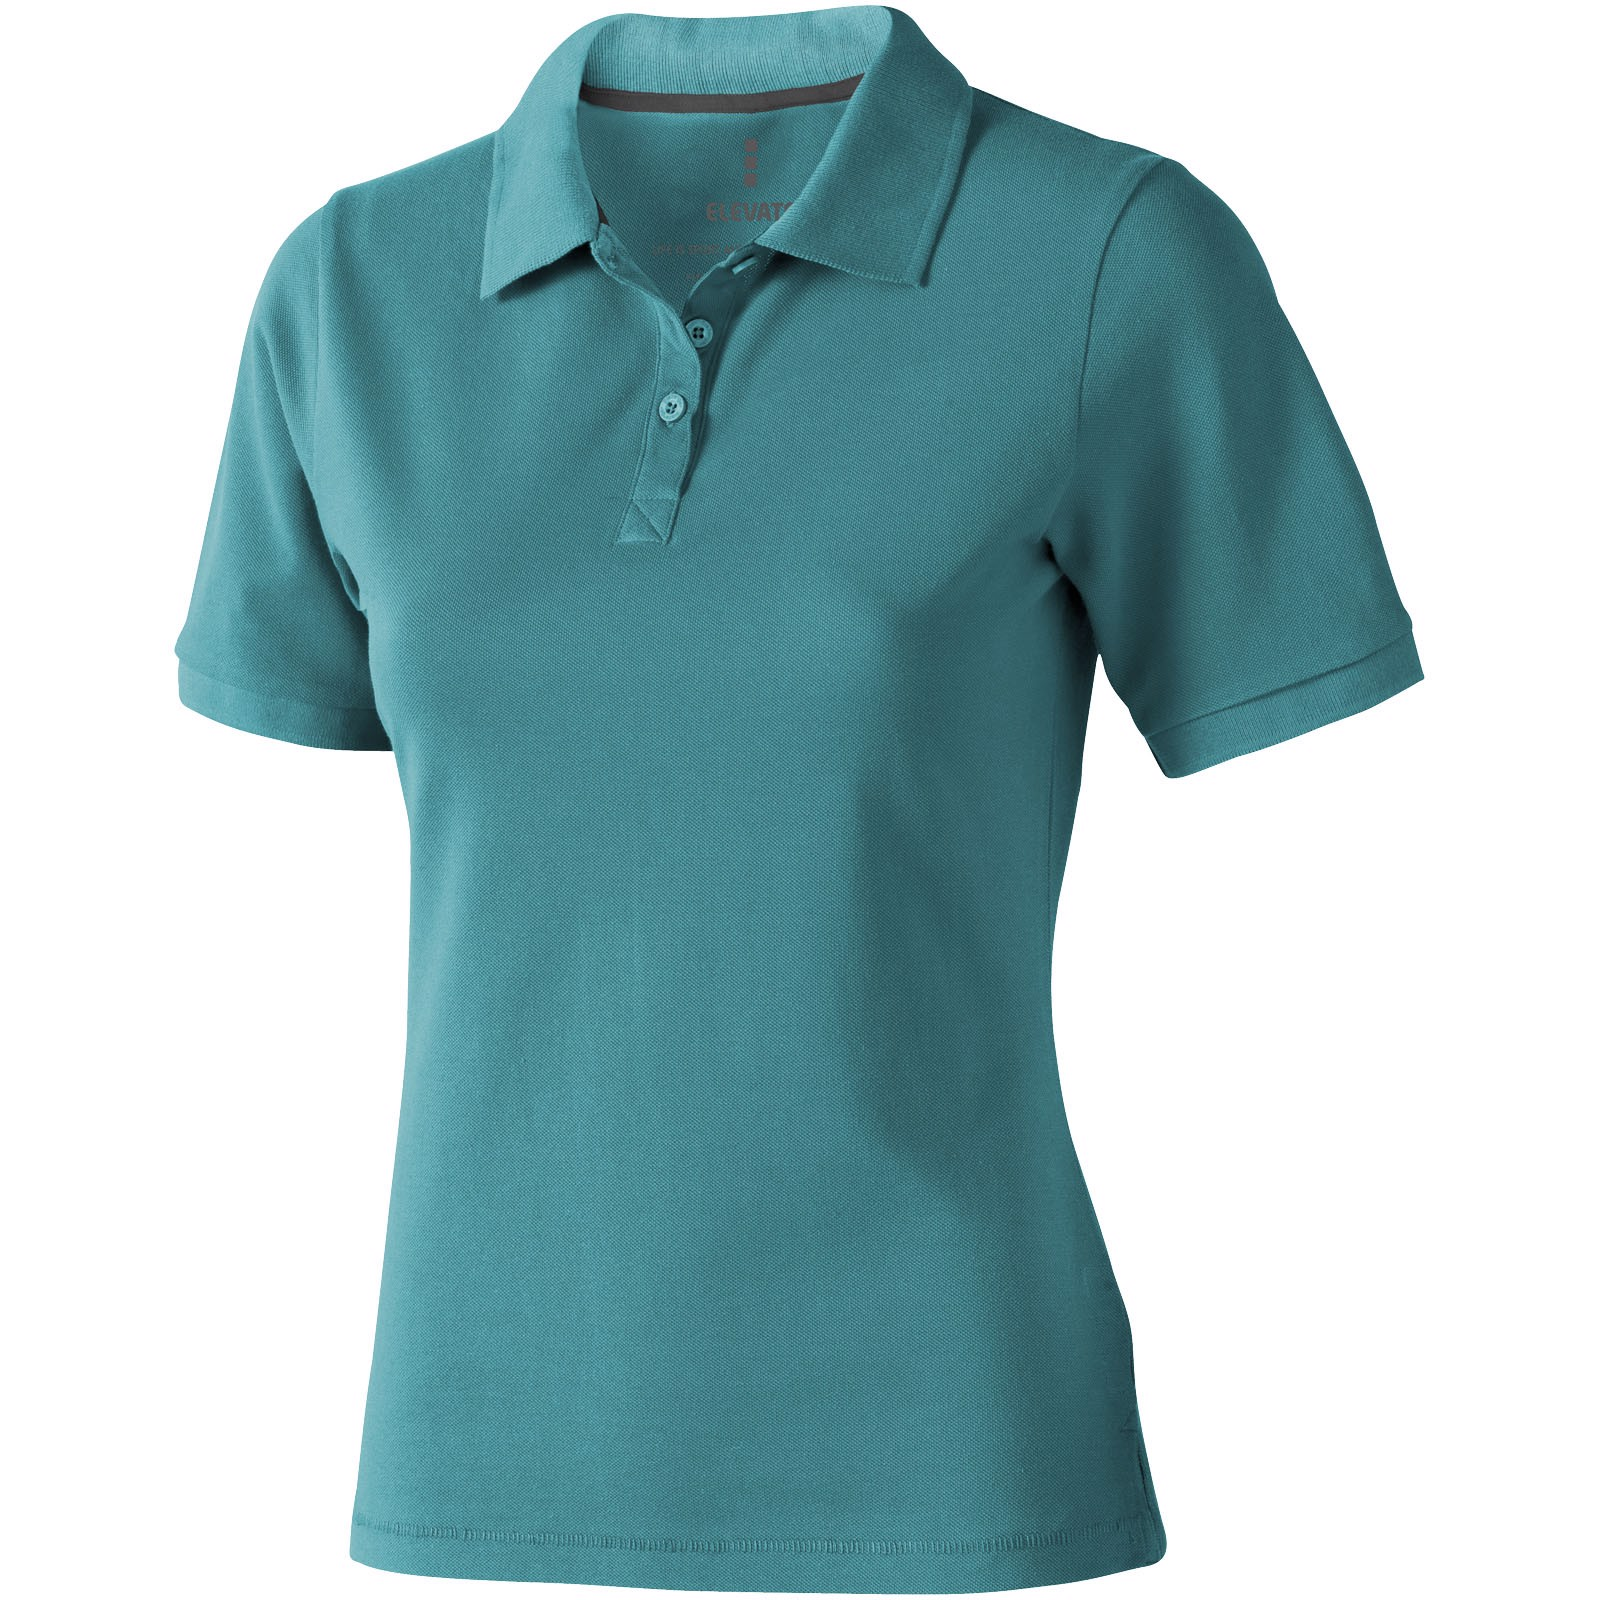 Calgary short sleeve women's polo - Aqua / M